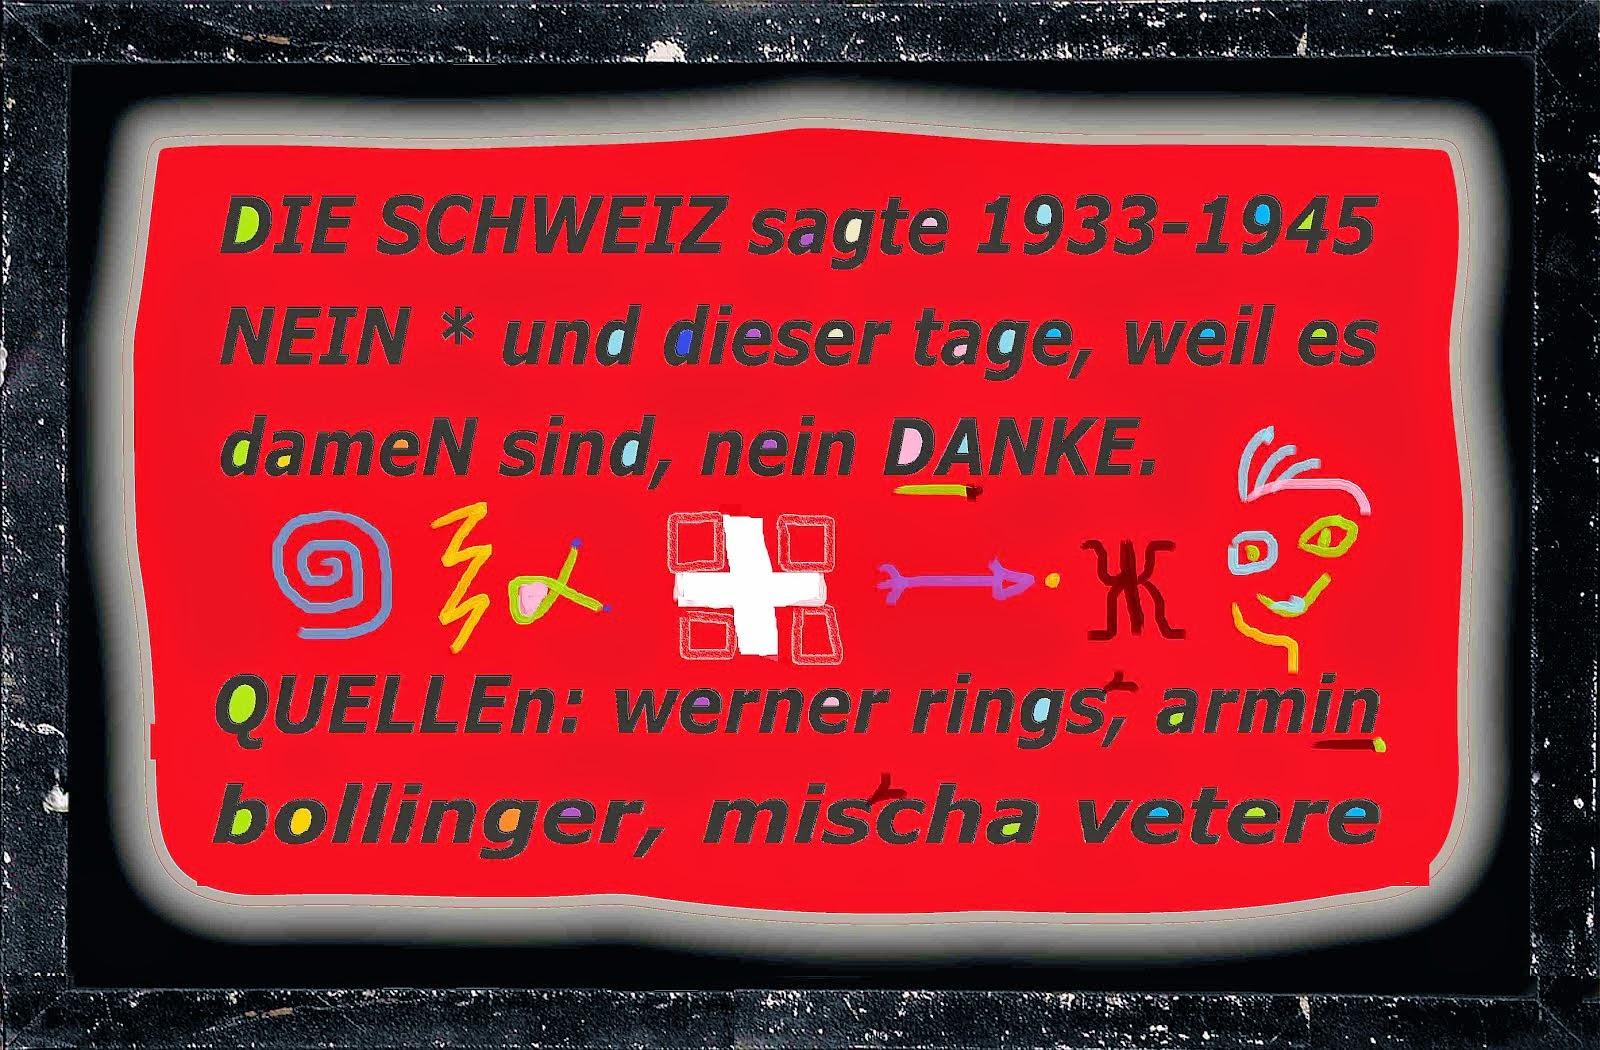 SCHWEIZ didier burkhalter FASCHISMUS suisse it nsa anne-marie blanc armin bollinger vetere rings